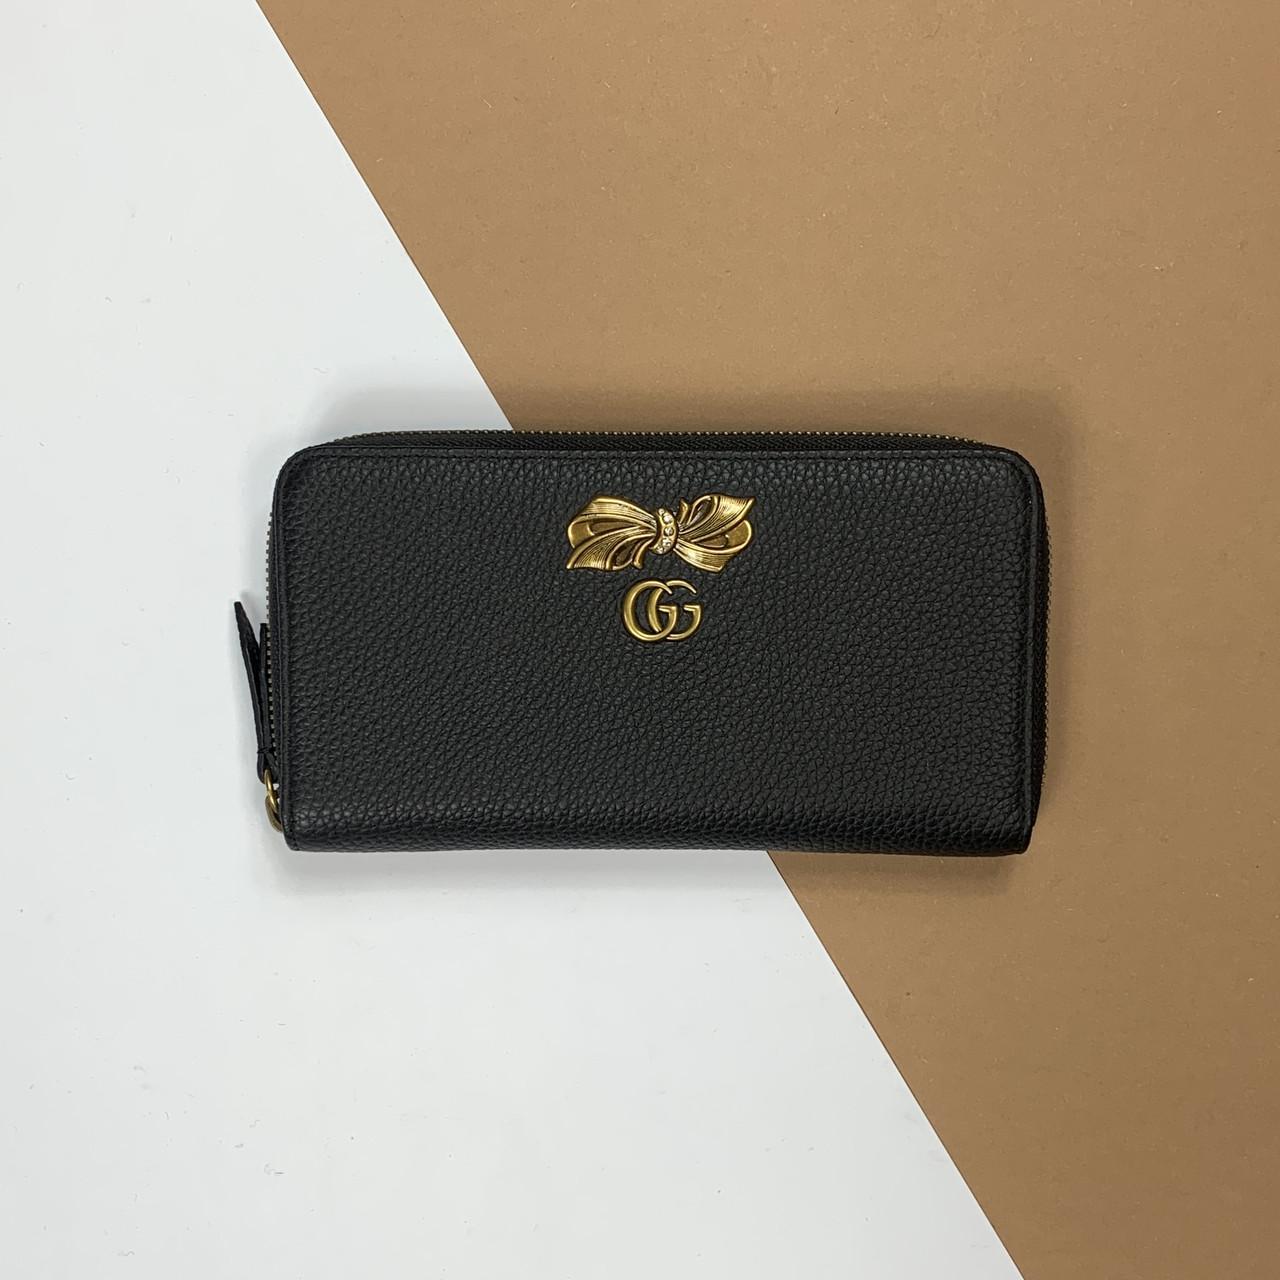 Женский кошелек Gucci (Гуччи) арт. 23-03